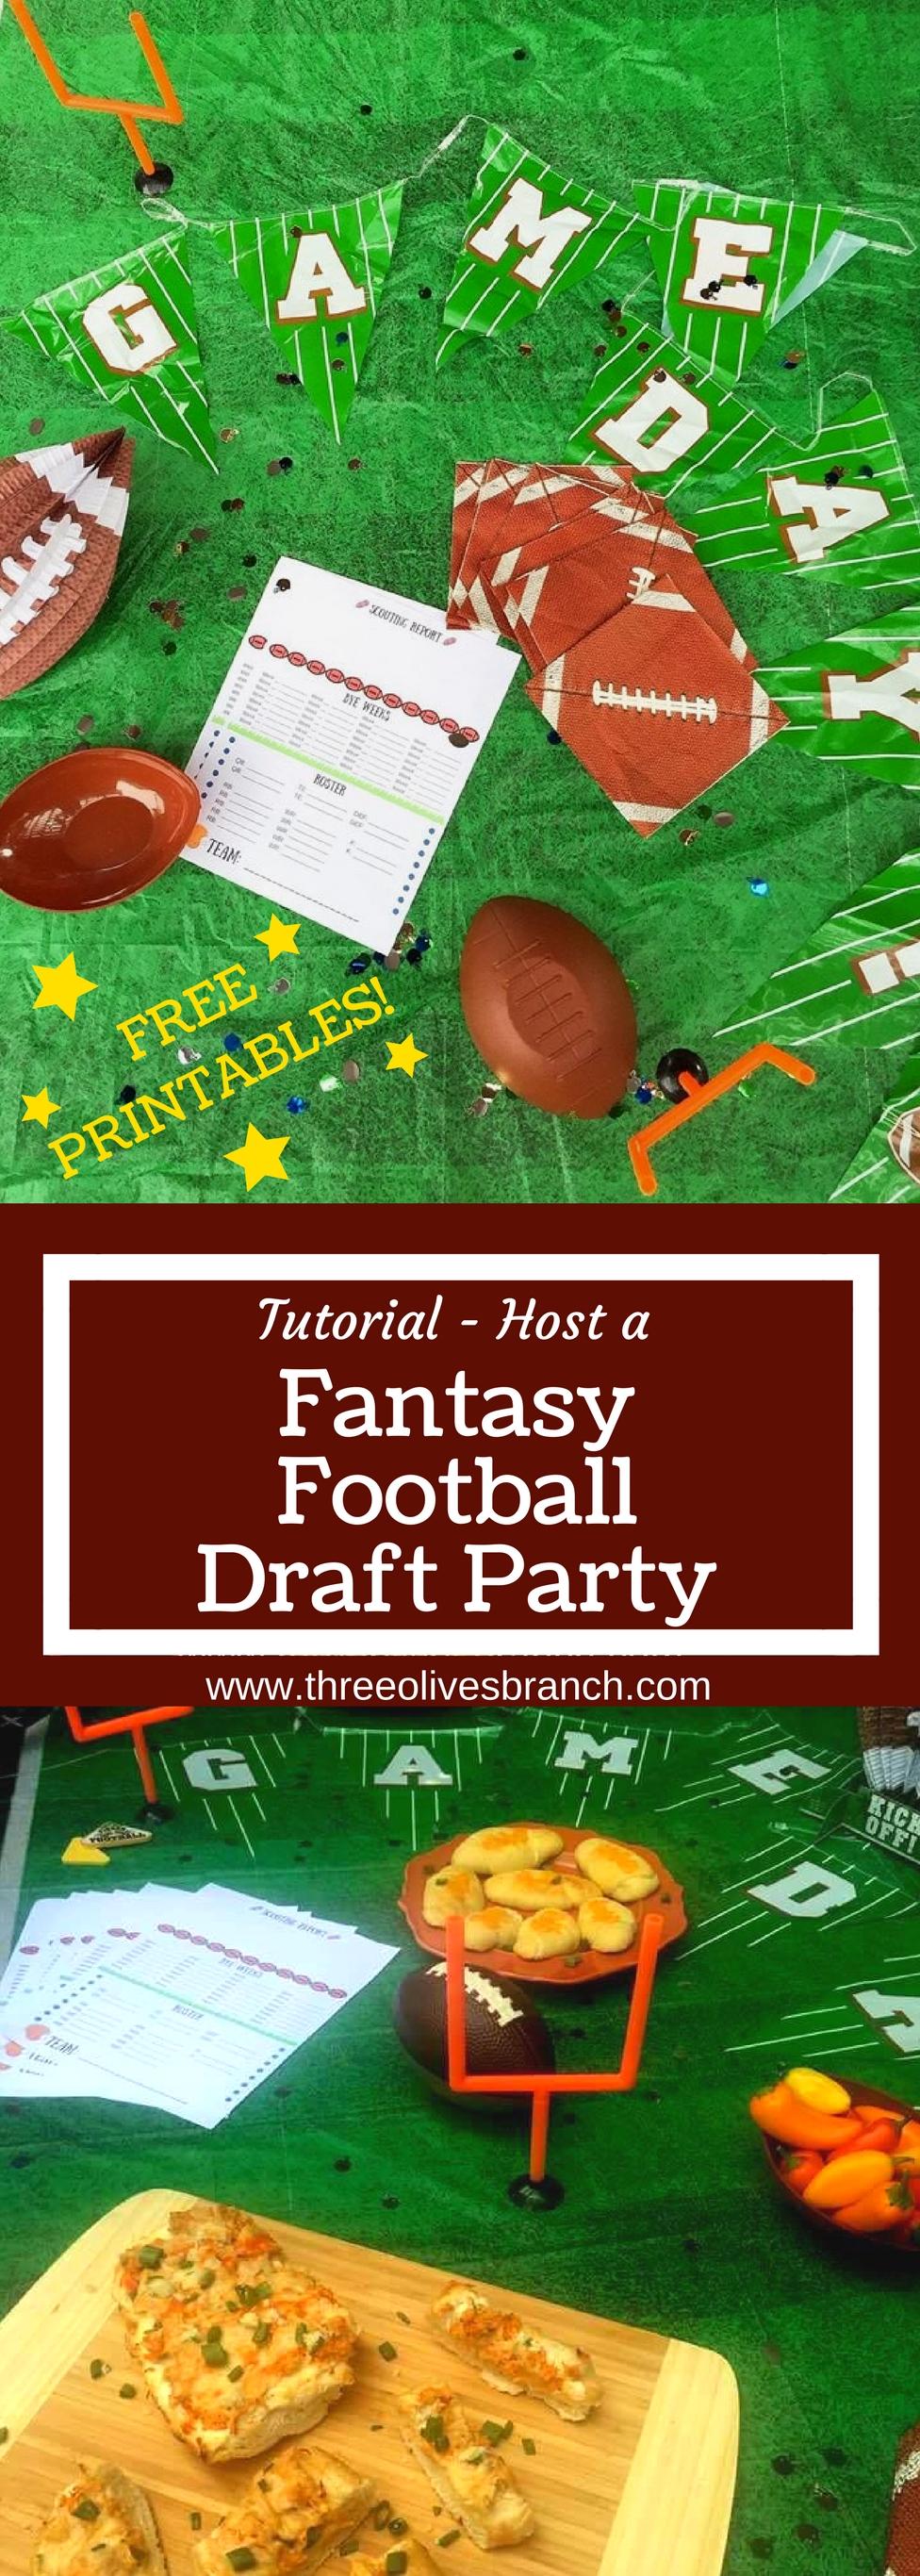 10 Elegant Fantasy Football Draft Party Ideas fantasy football draft party three olives branch 2020